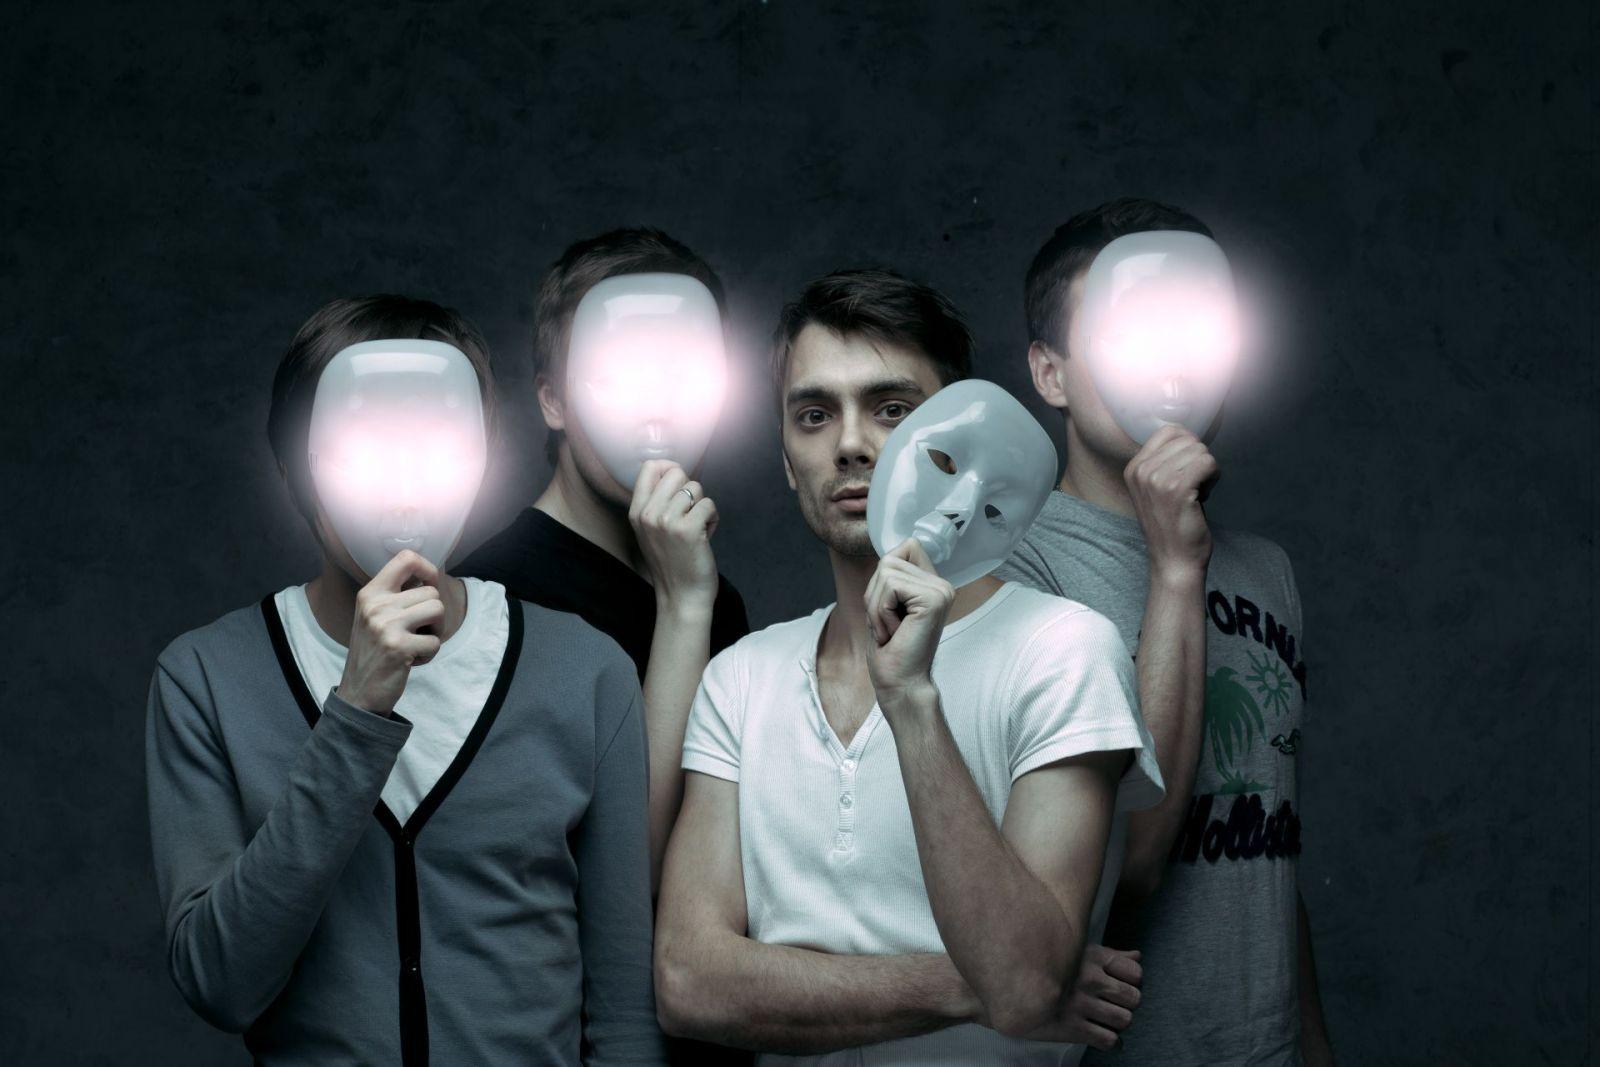 Казантип 2013: подробности и лайн-ап - фото №5